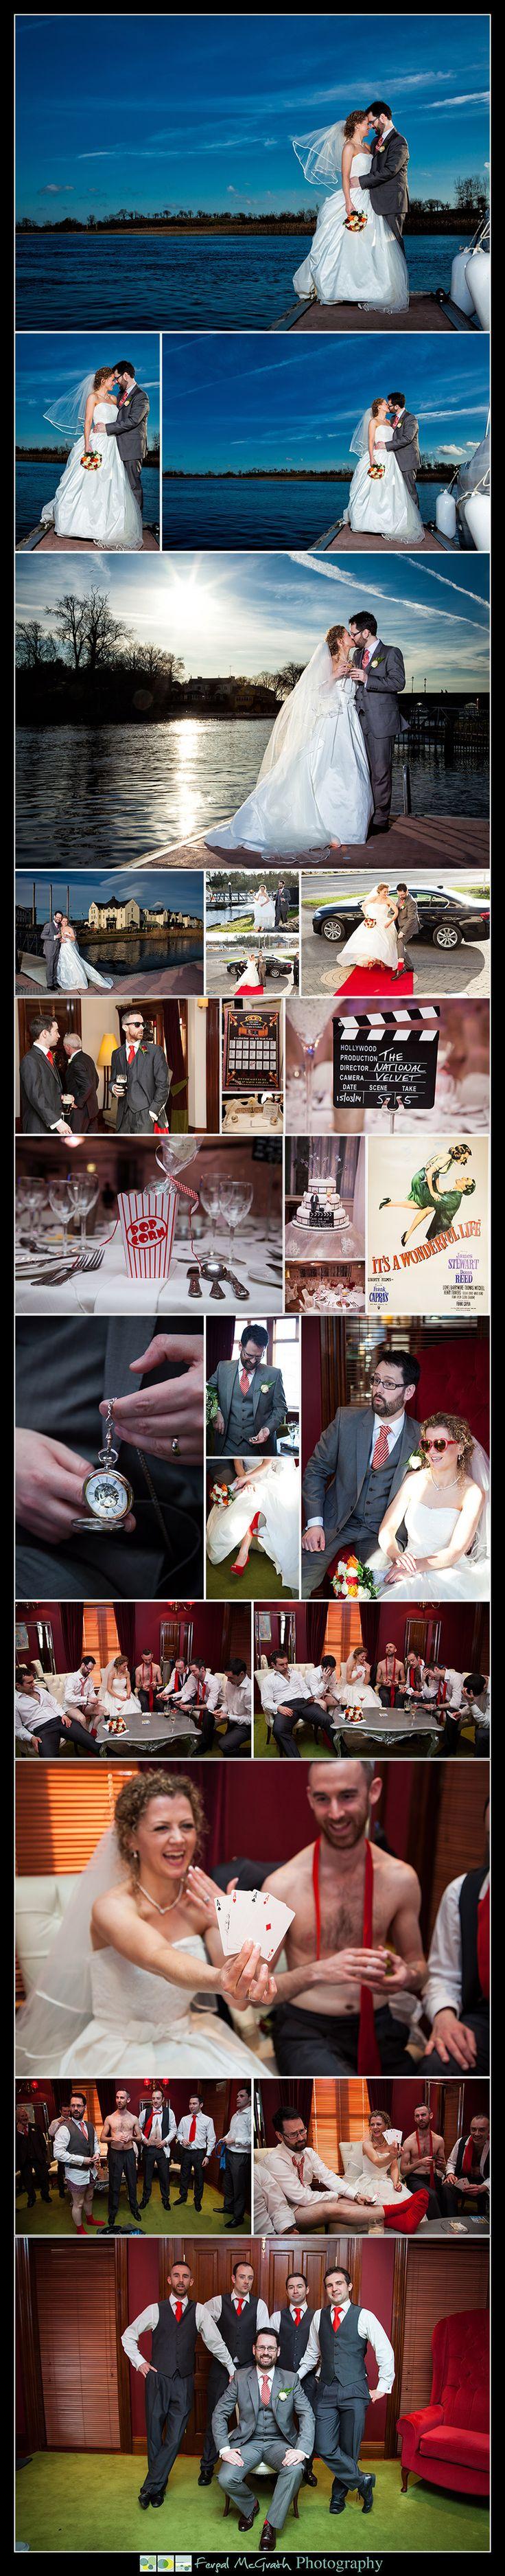 weddings at the landmark hotel carrick on shannon